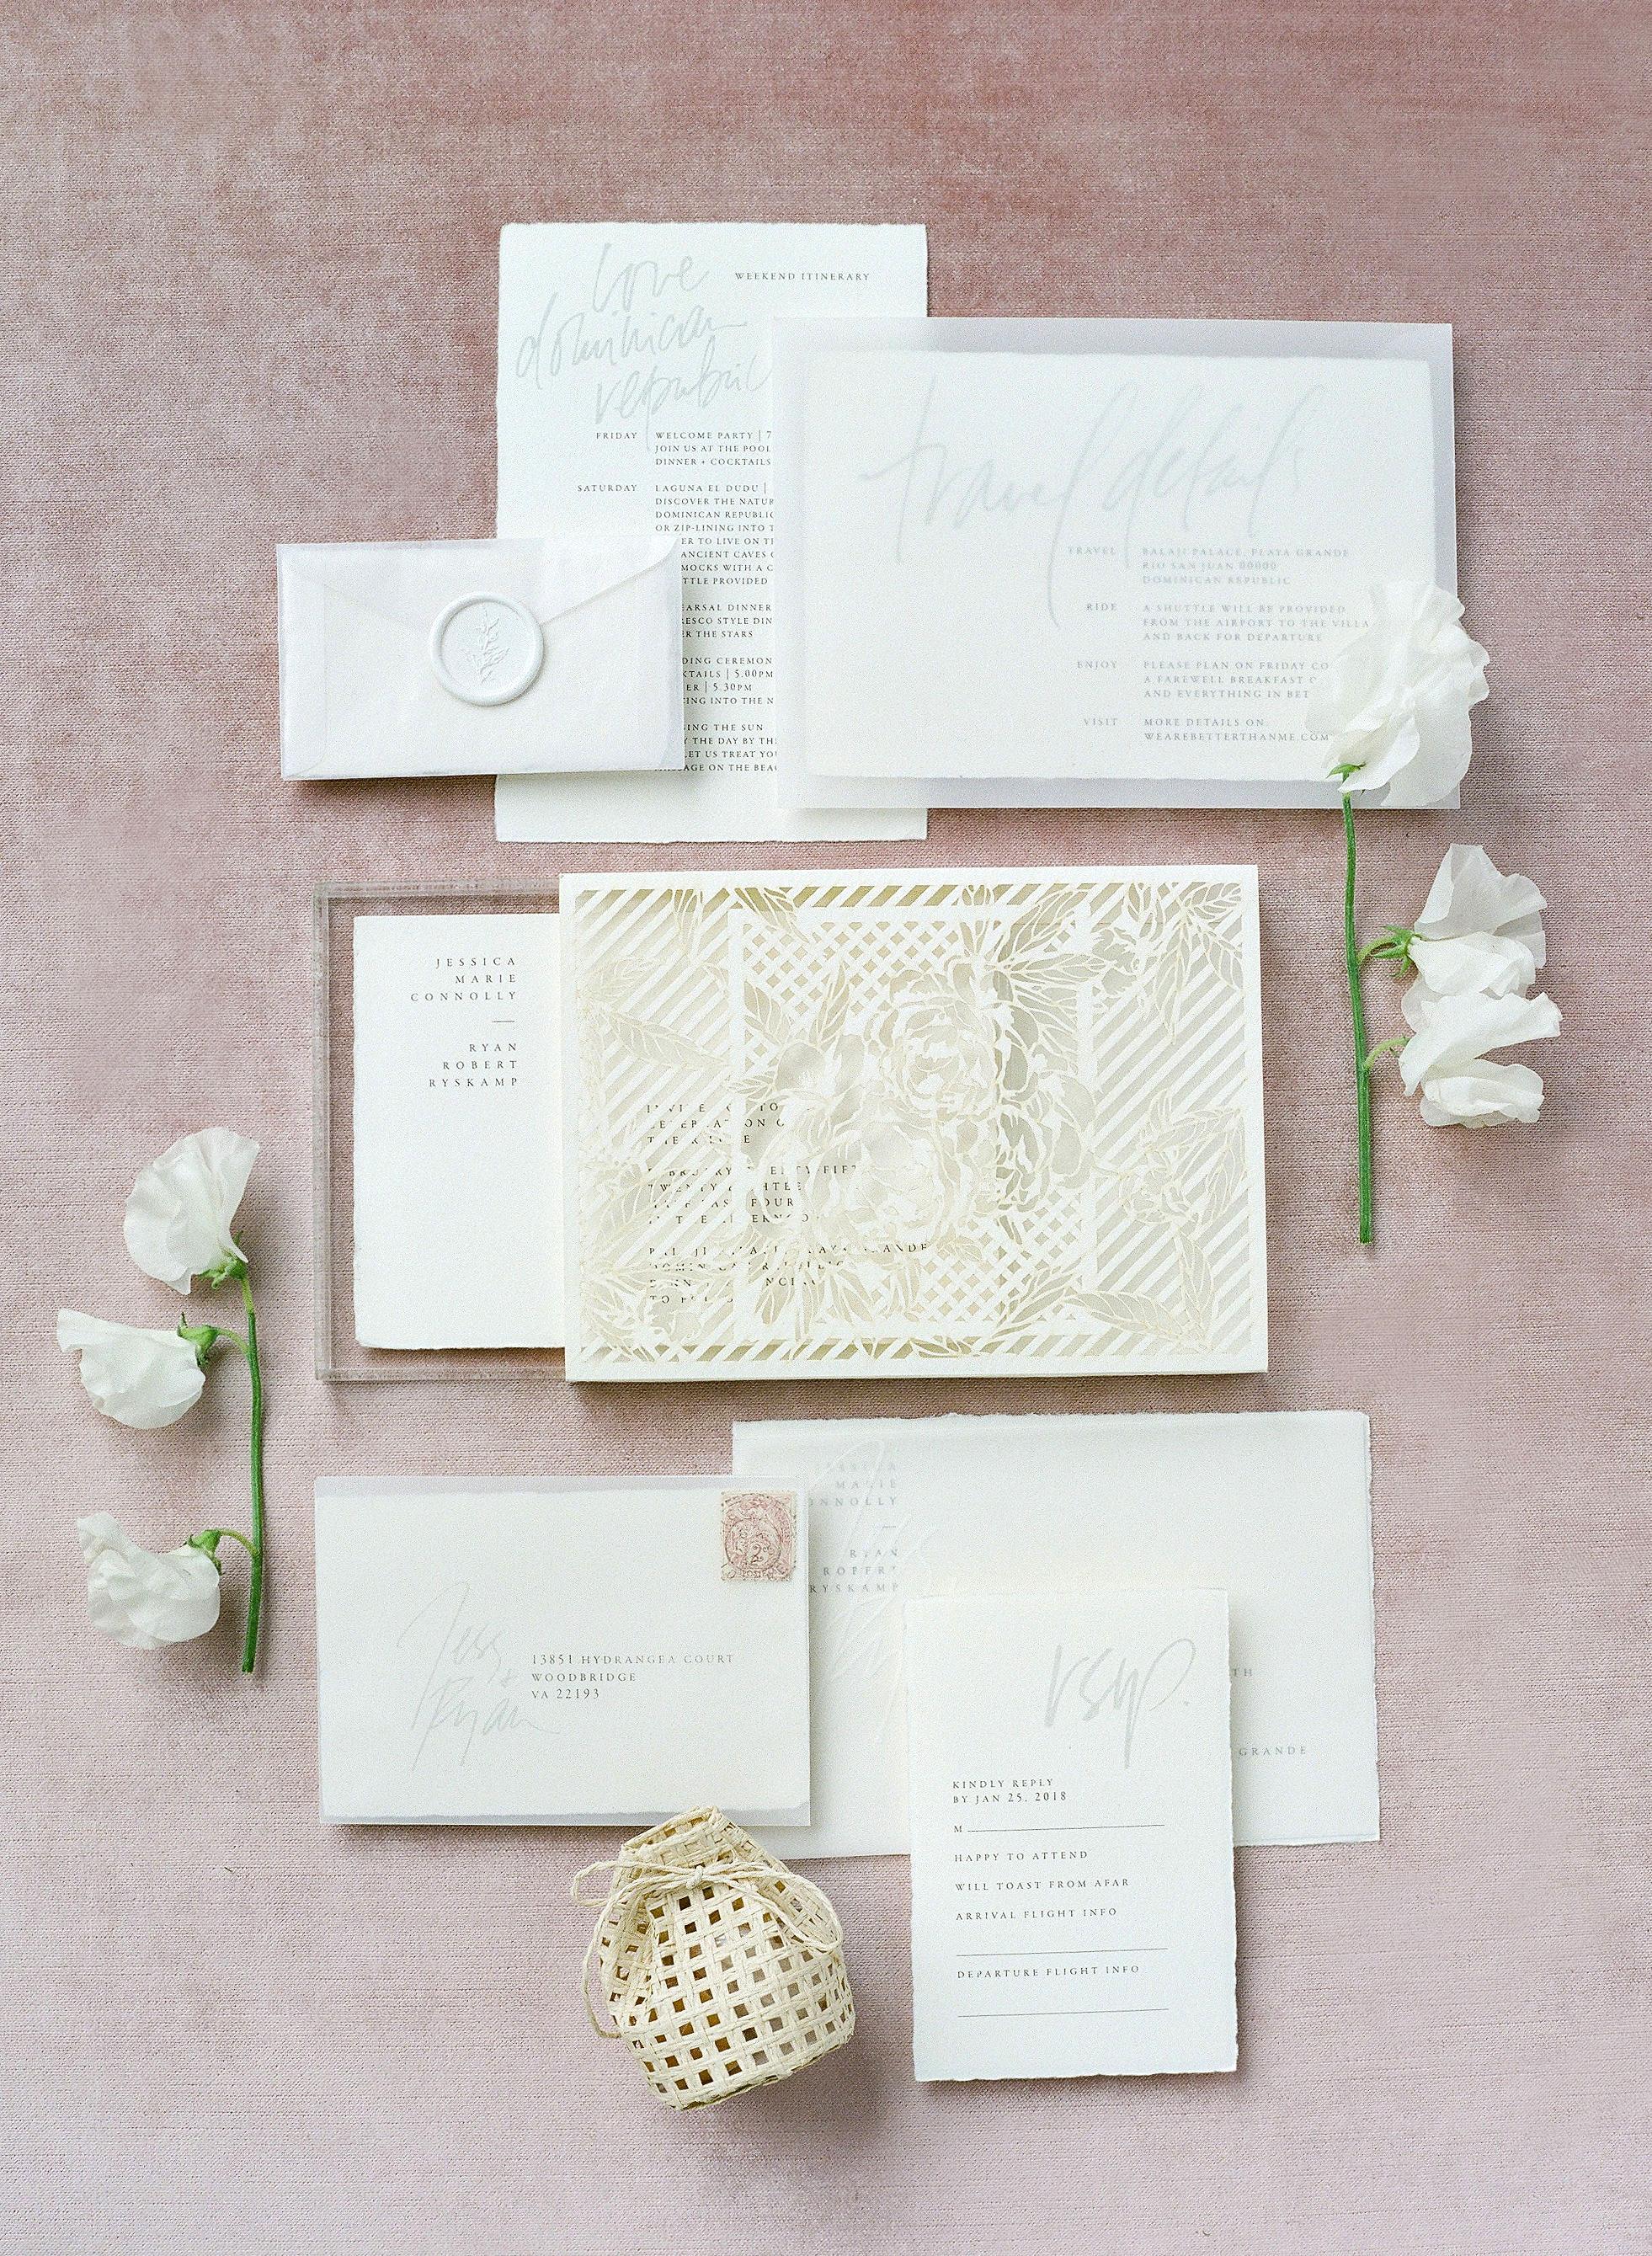 jessica ryan wedding invitations